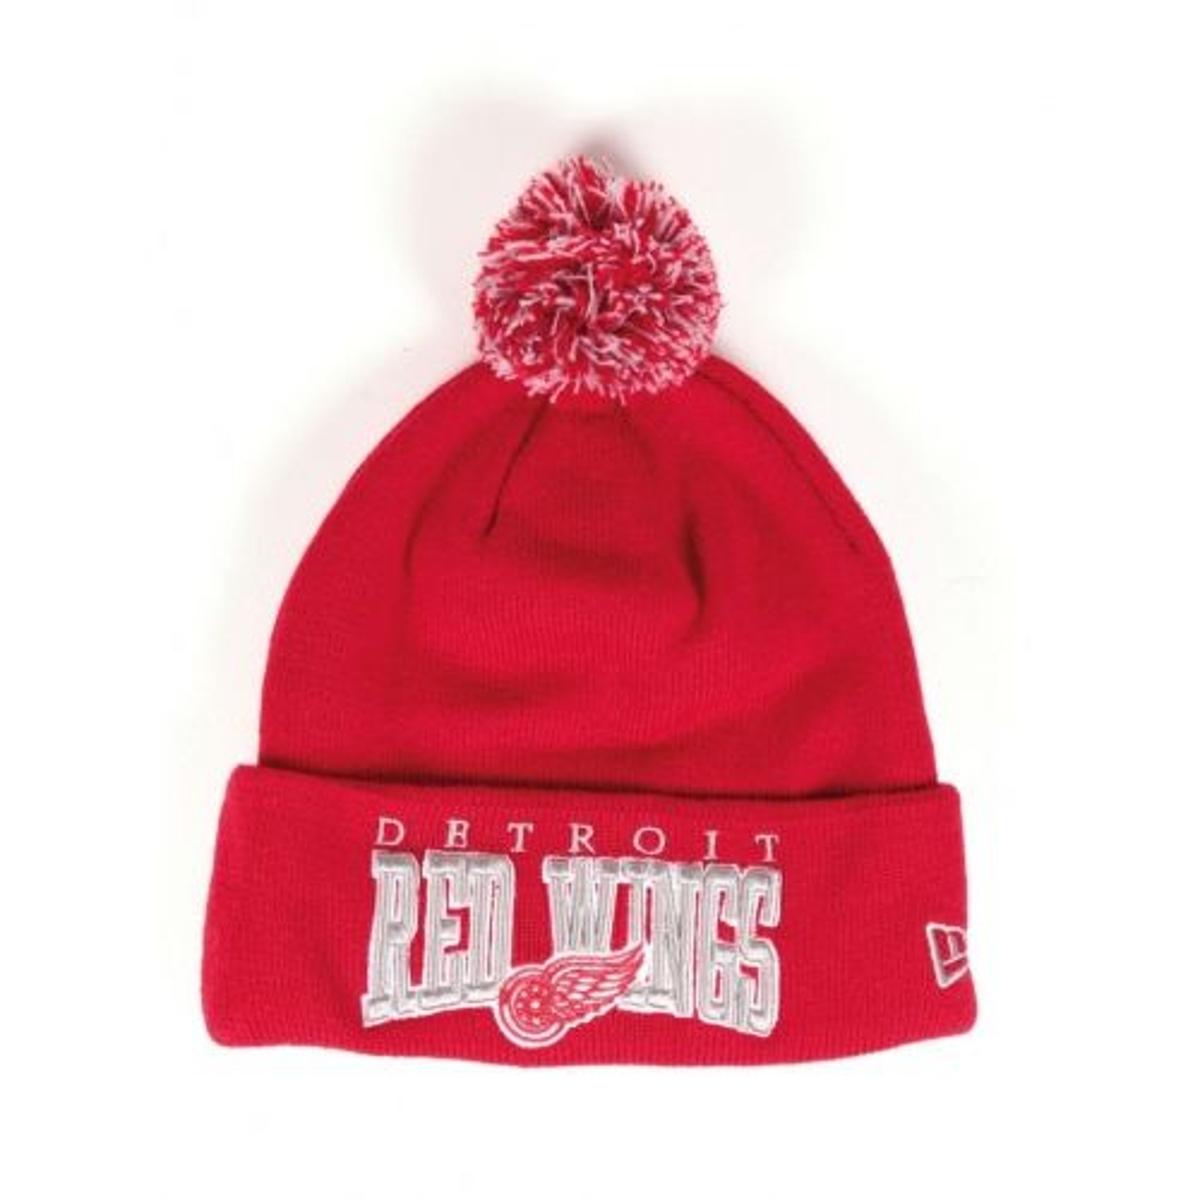 Bonnet Detroit RED WINGS - Arch Cuff - NHL